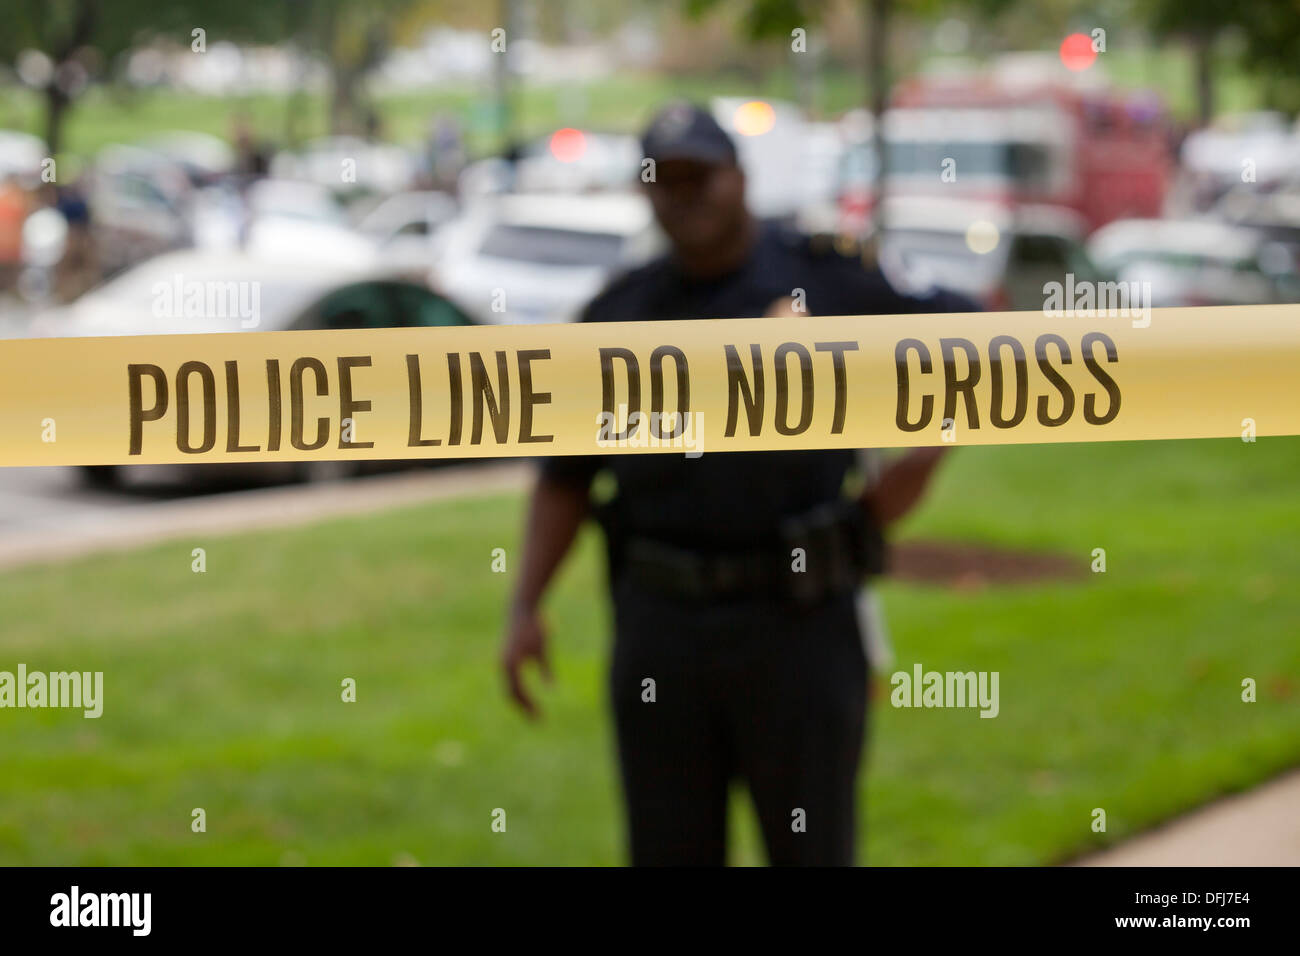 Policeman standing behind police line tape at a crime scene - Washington, DC USA - Stock Image